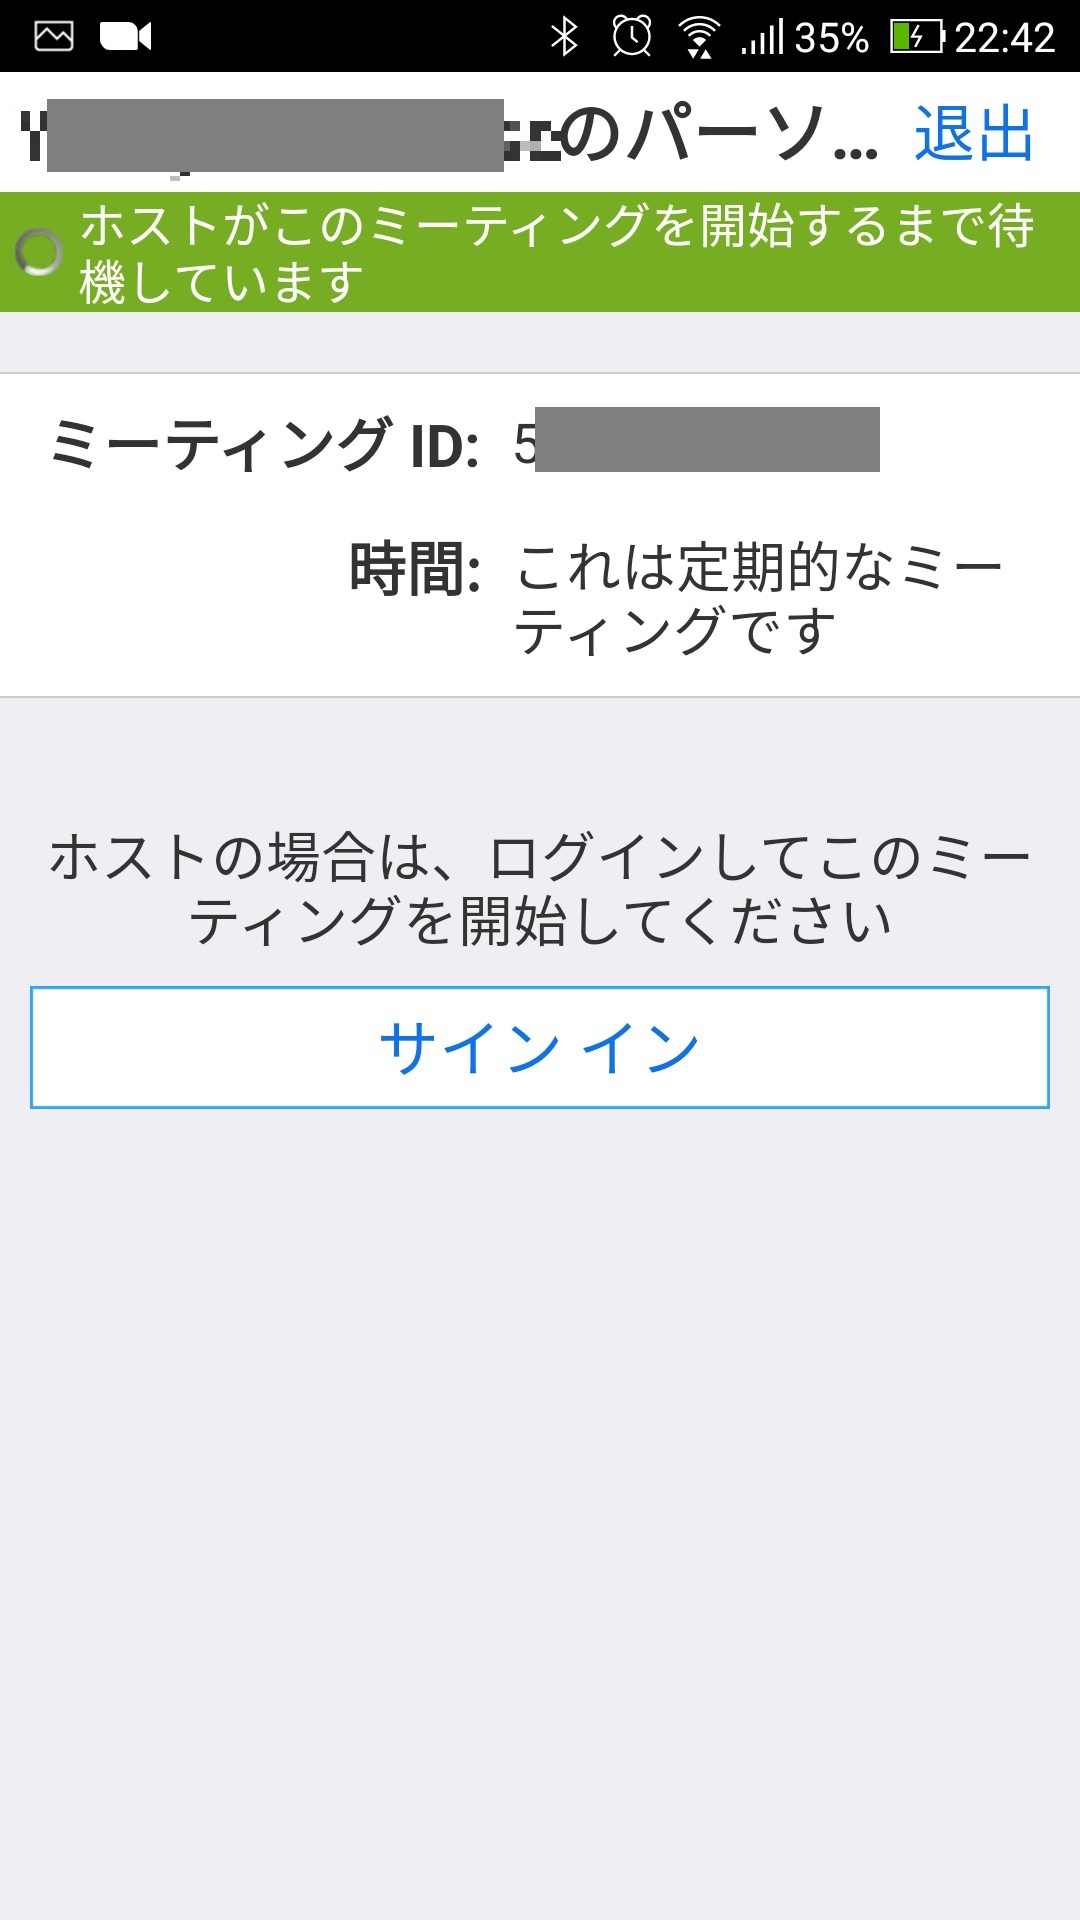 Screenshot 20200416 224239 - Zoomの使い方~一人で総合セルフチェック(パソコンとスマホを使って自分で)